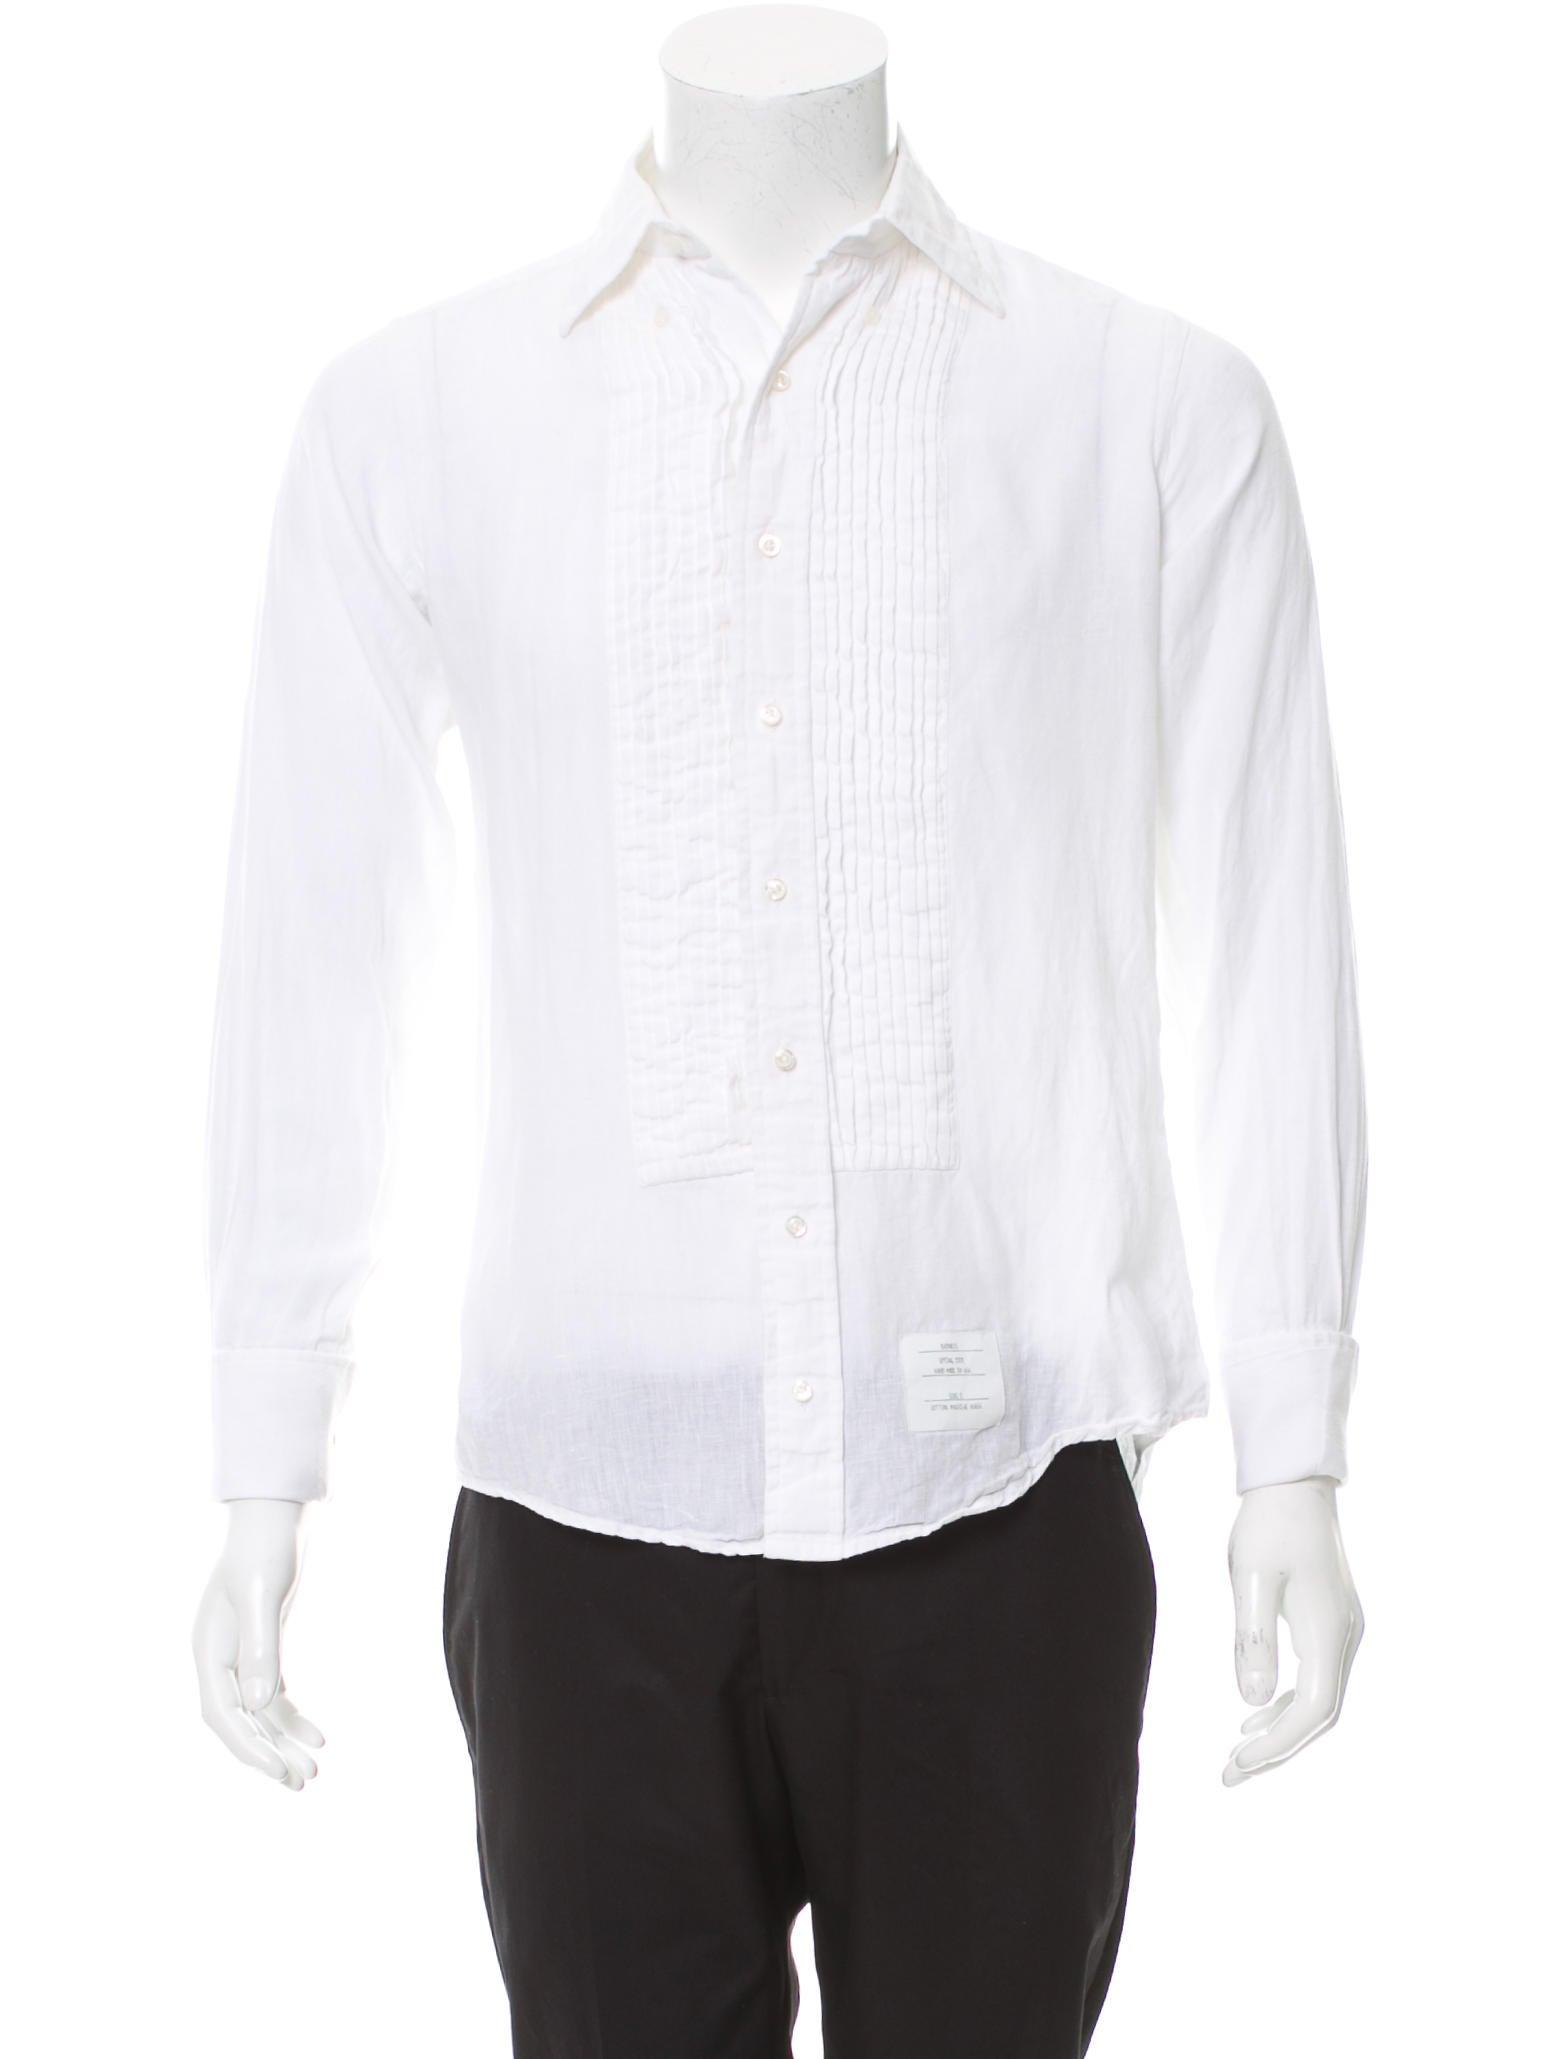 Thom browne french cuff tuxedo shirt clothing tho22063 for Tuxedo shirt french cuff